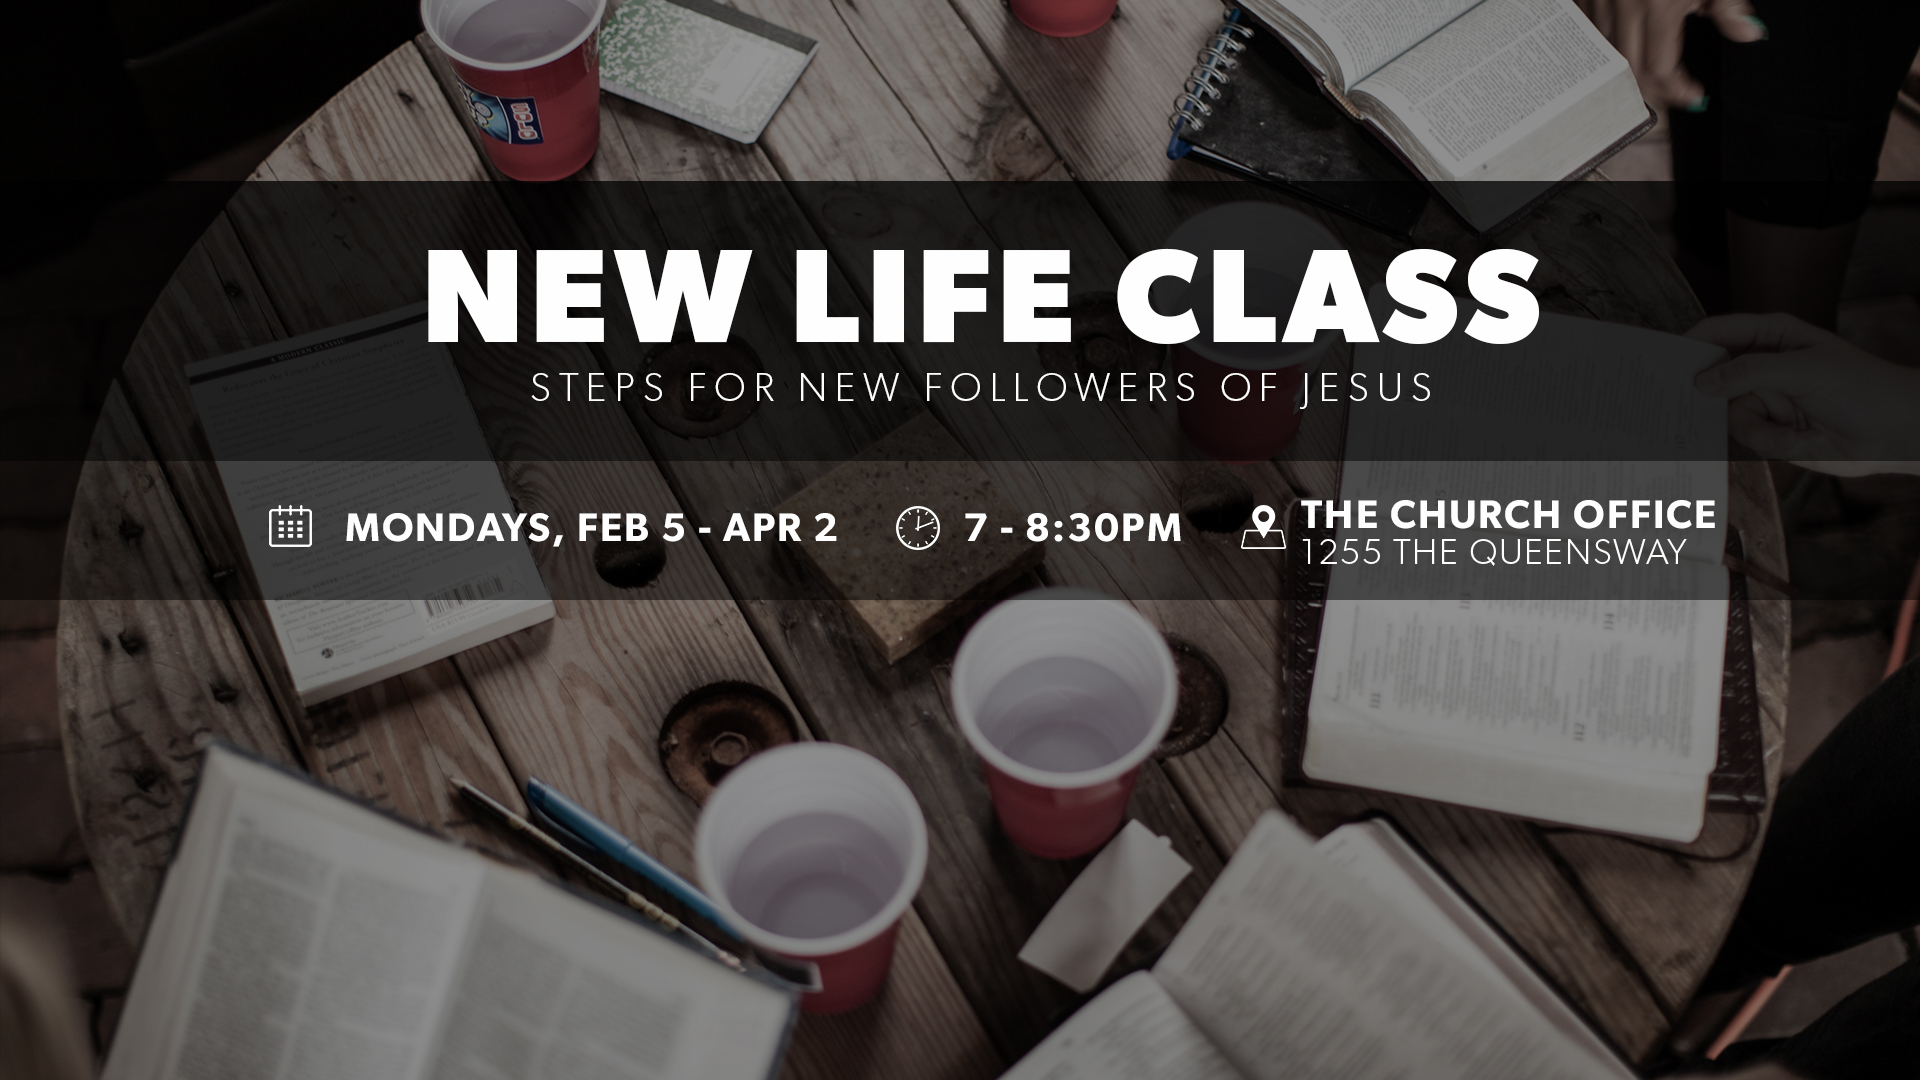 New life class announcement